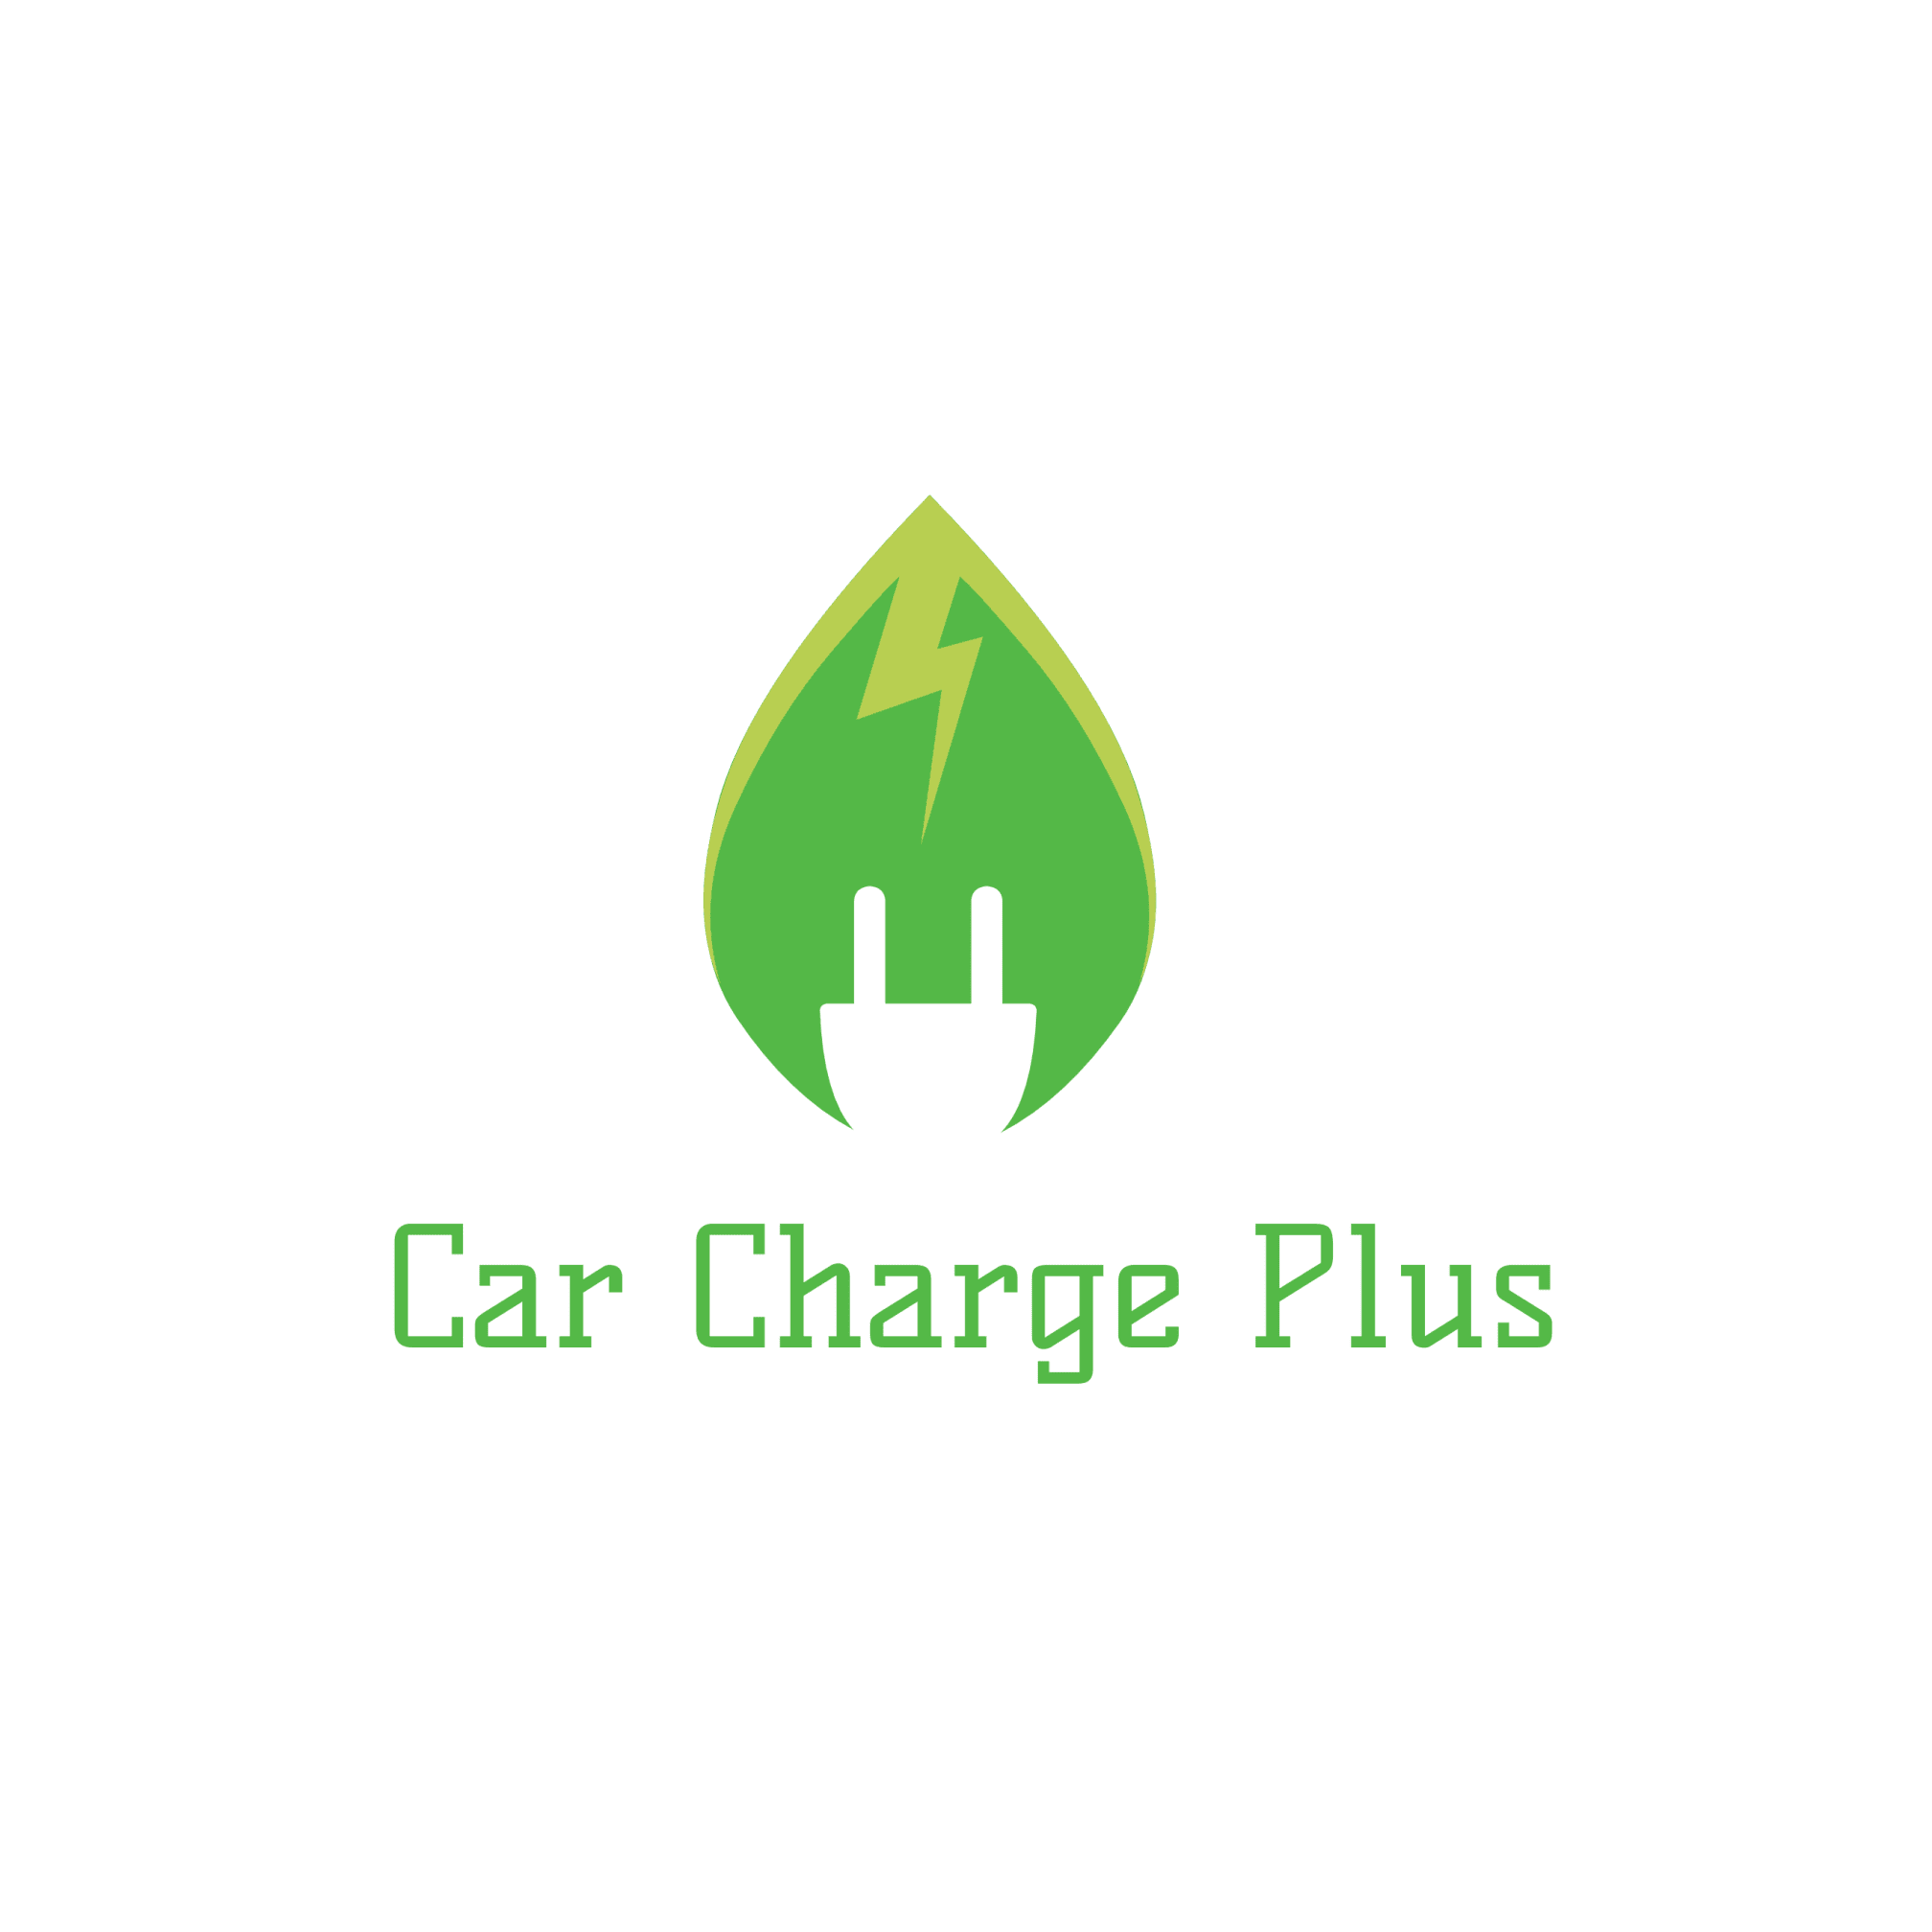 Car Charge Plus - Uxbridge, Buckinghamshire UB9 5NB - 01895 834915 | ShowMeLocal.com